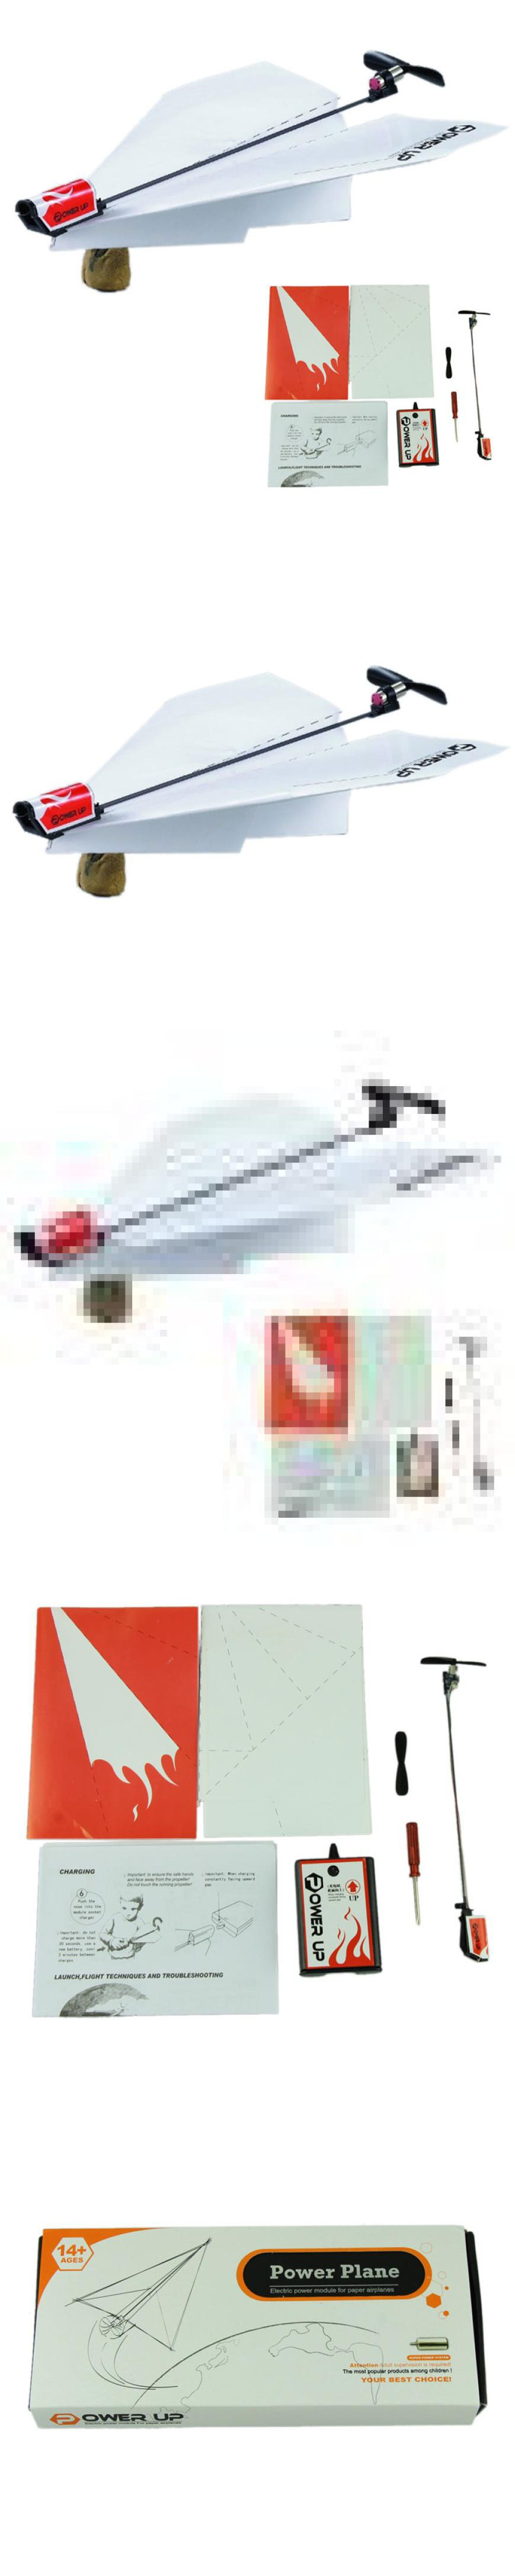 Power up electric paper plane airplane conversion kit fashion